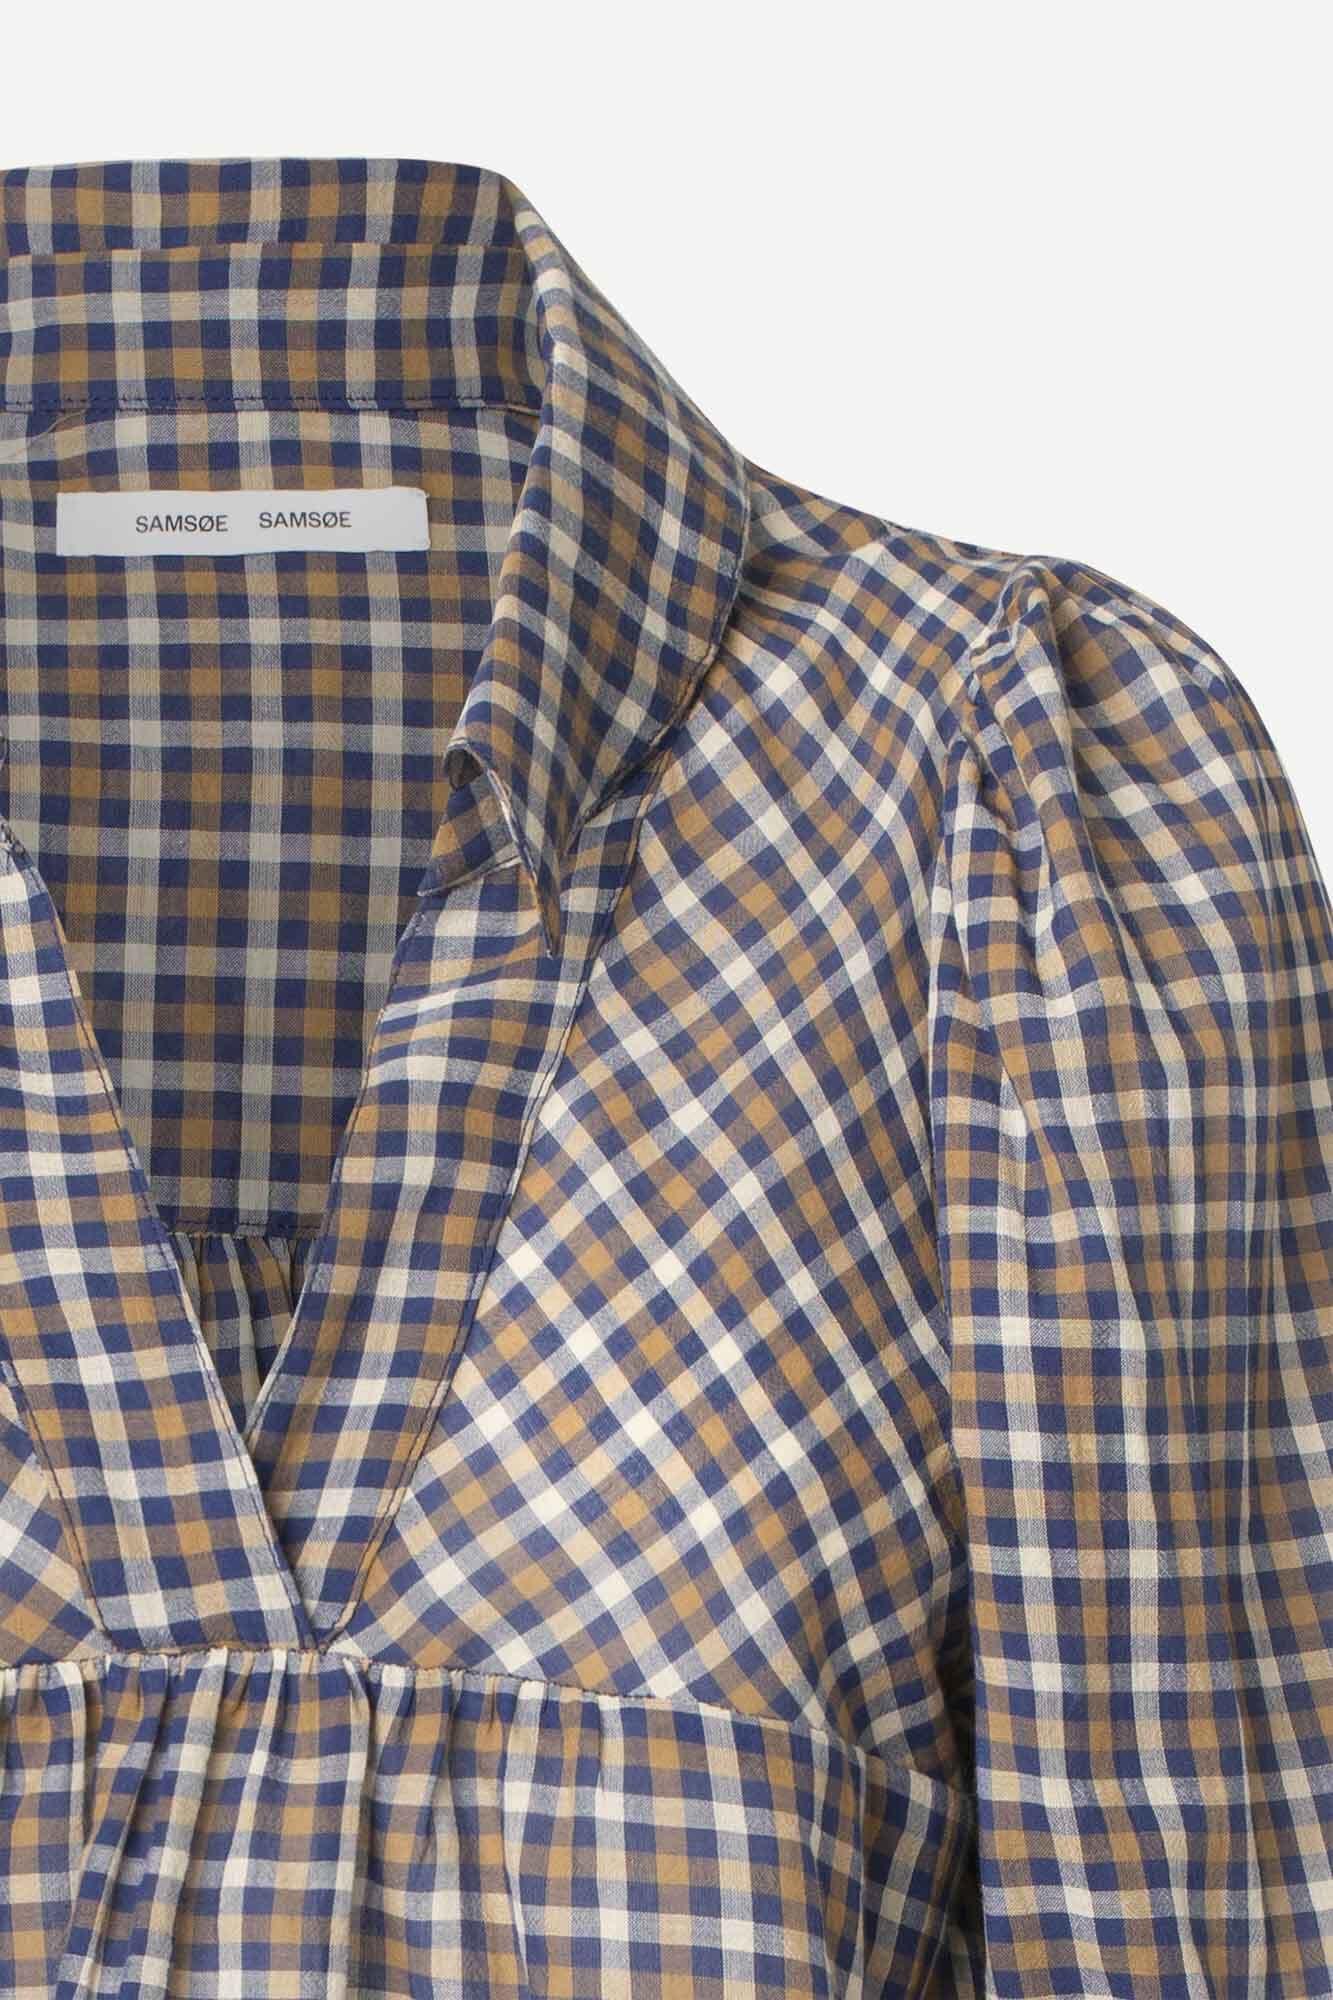 Opal shirt Samsoe-3